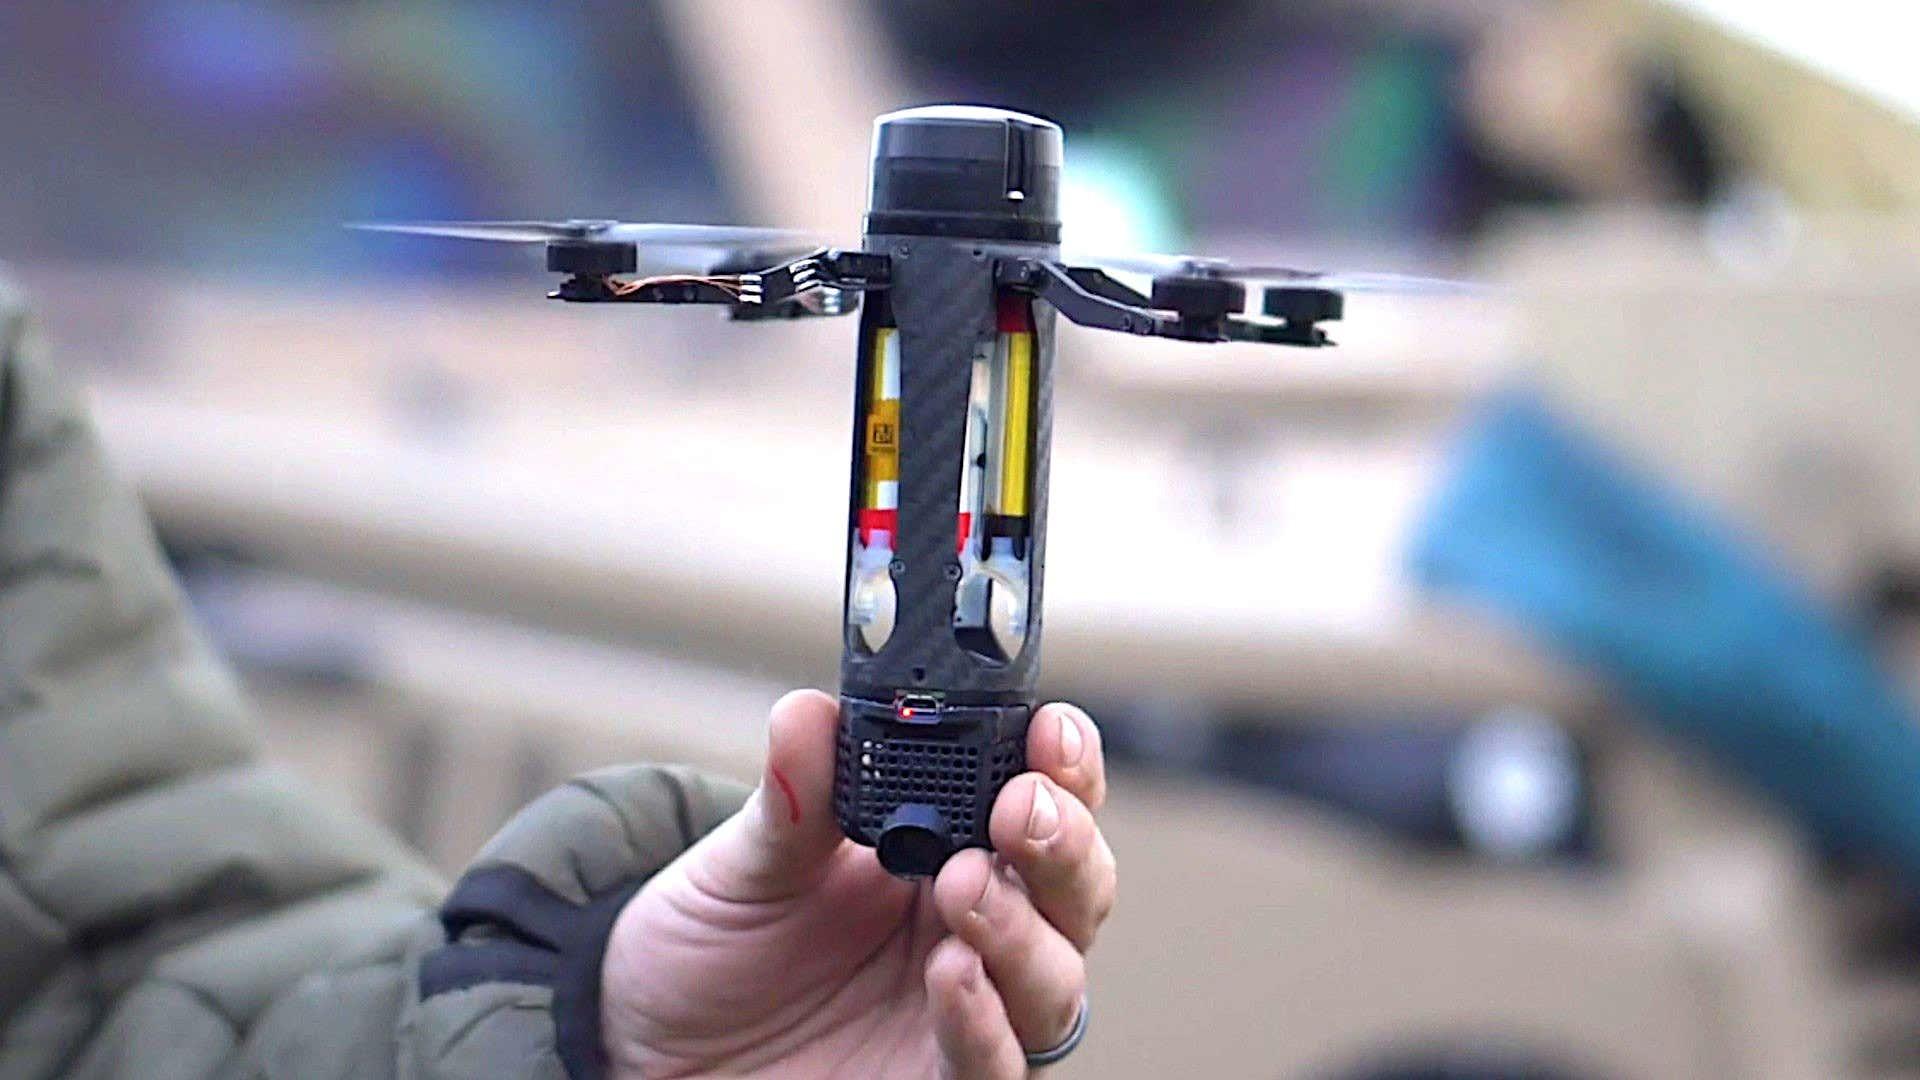 message-editor_1625856022492-drone402.jpg